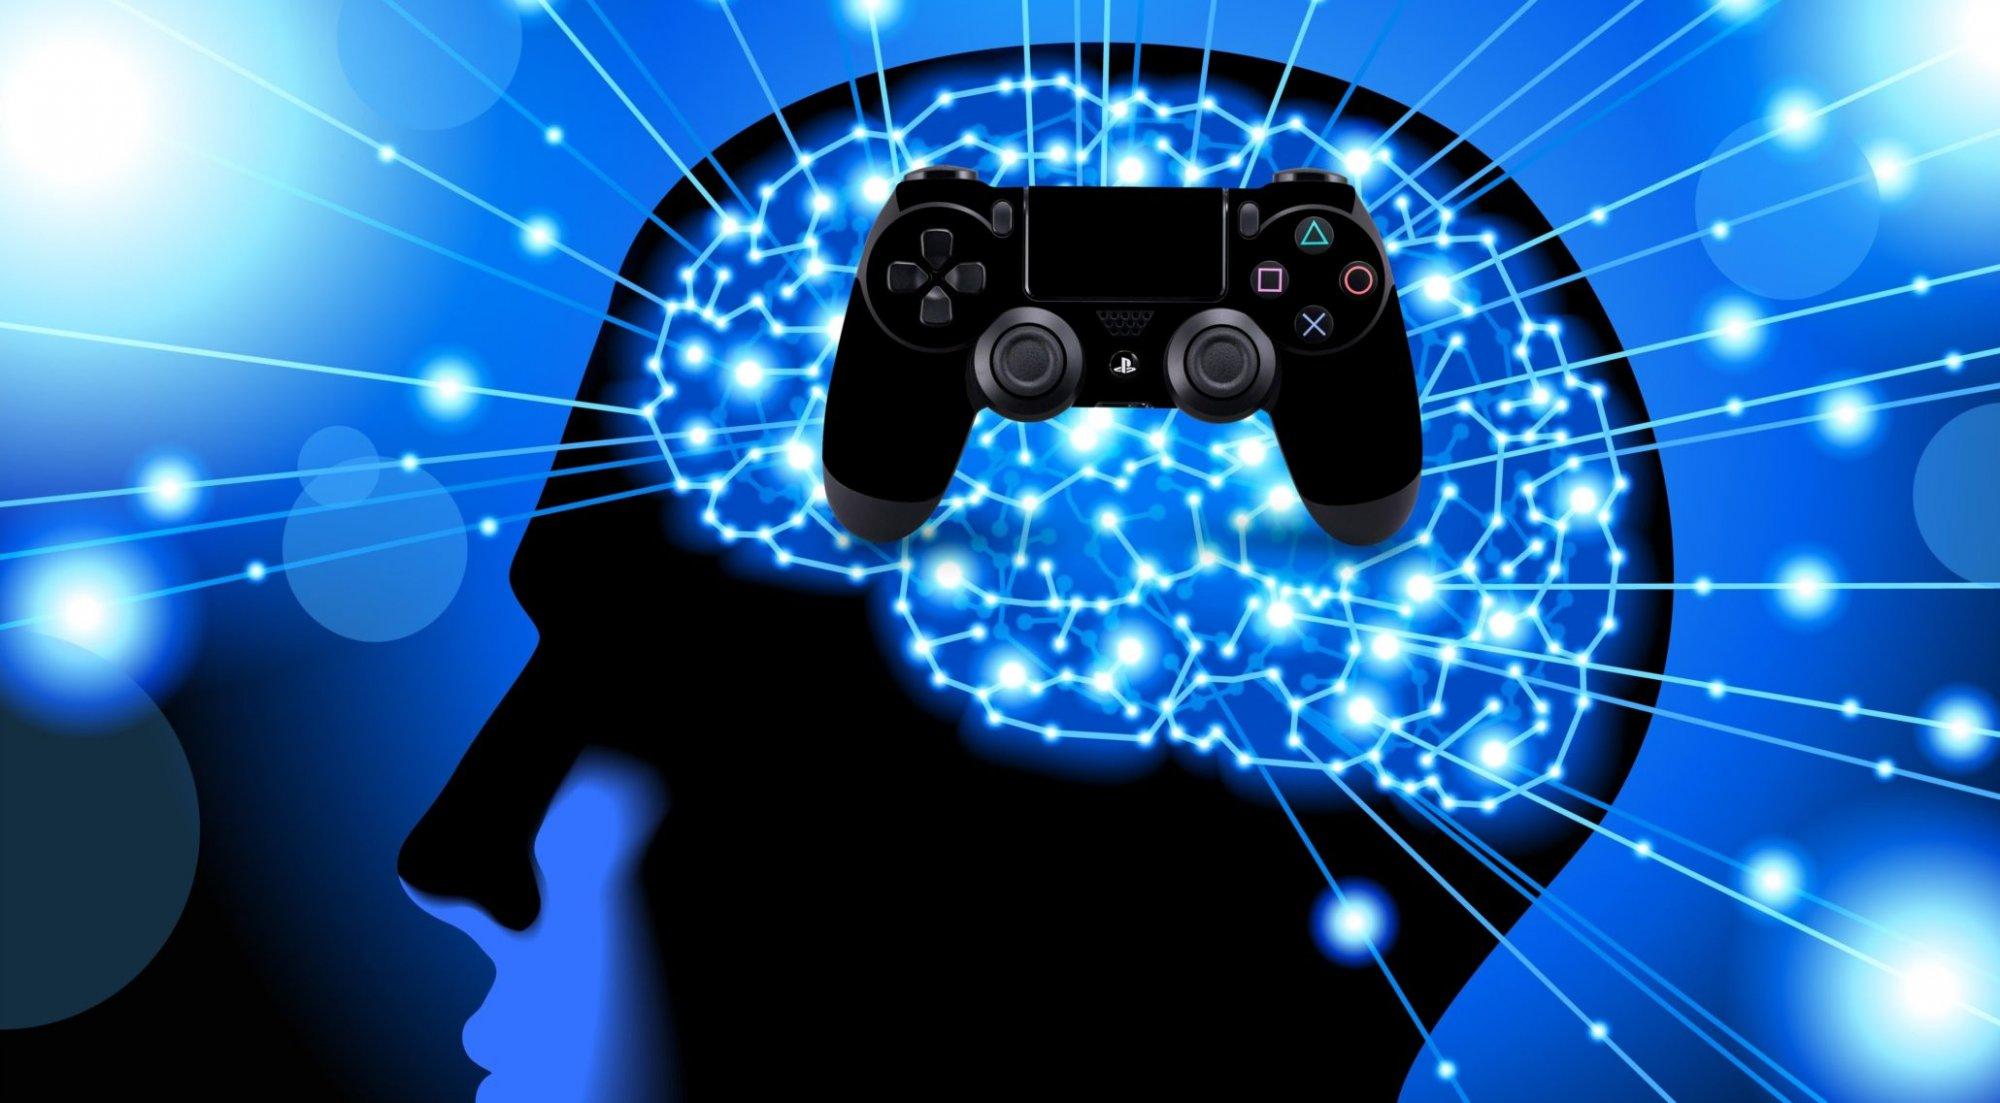 Gaming-Disorder-a-Disease-01-Header-2060x1137.jpg